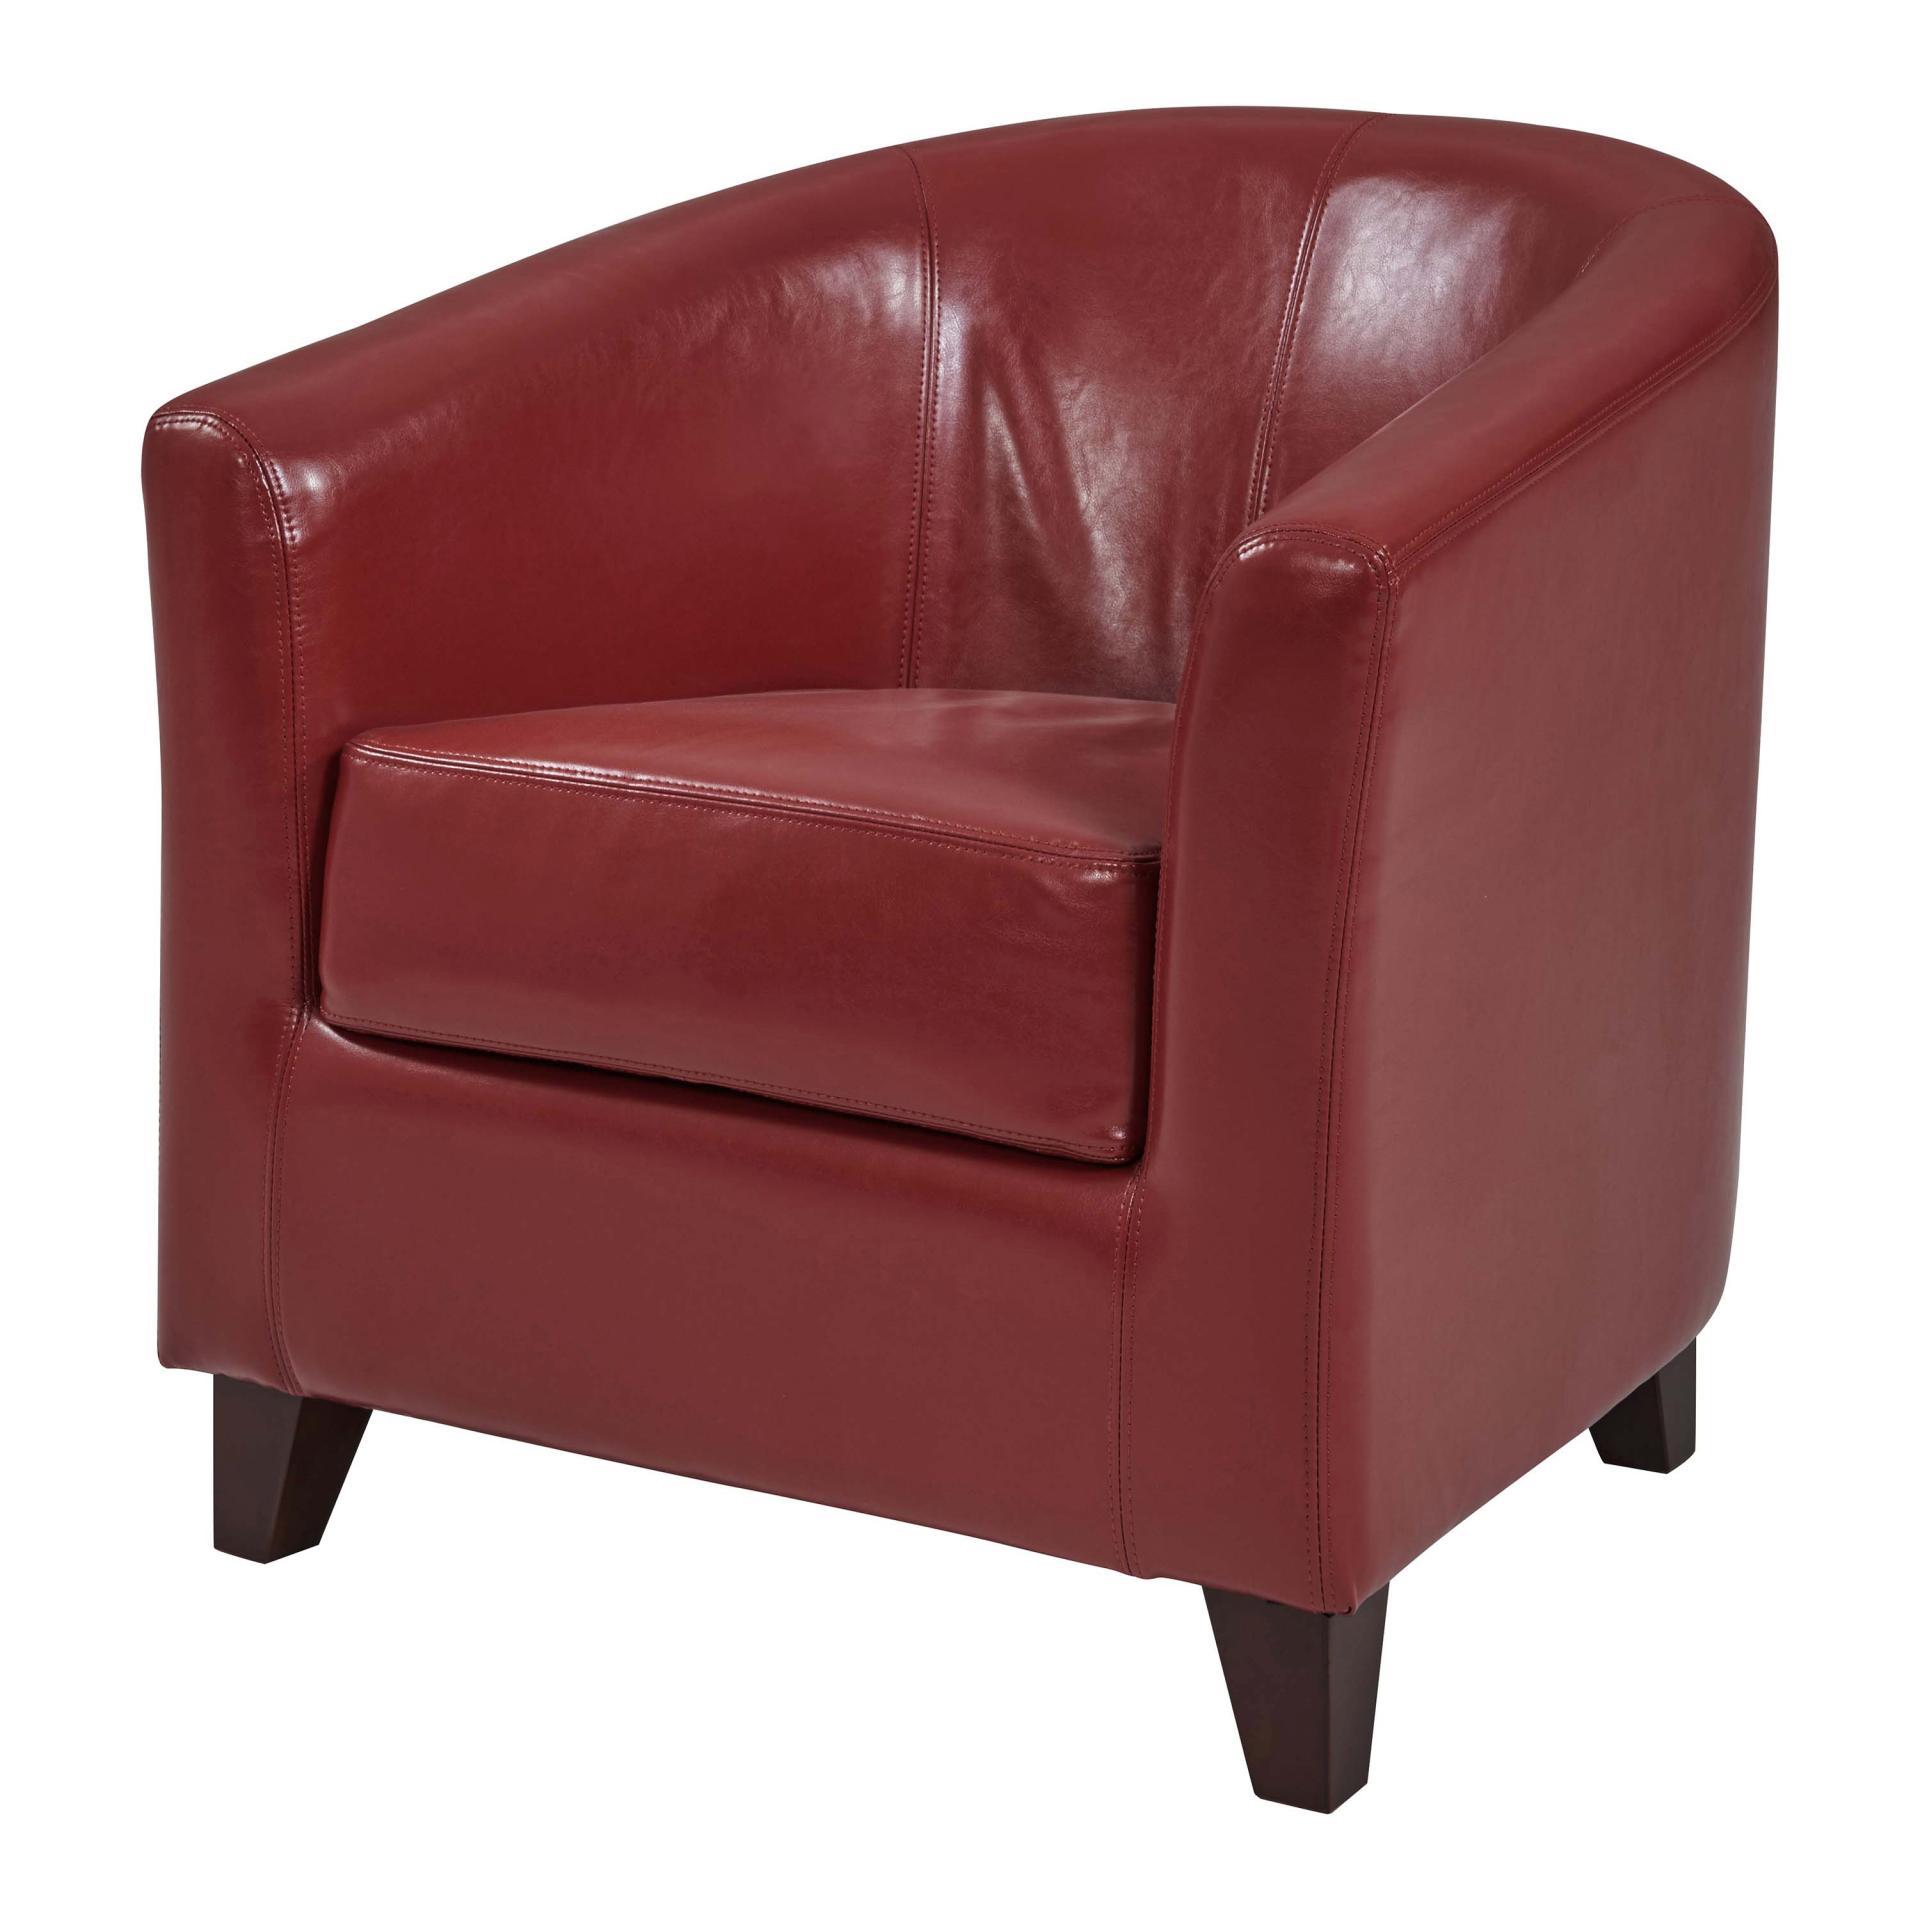 193010b 67 Npd Home Furniture Wholesale Lifestyle